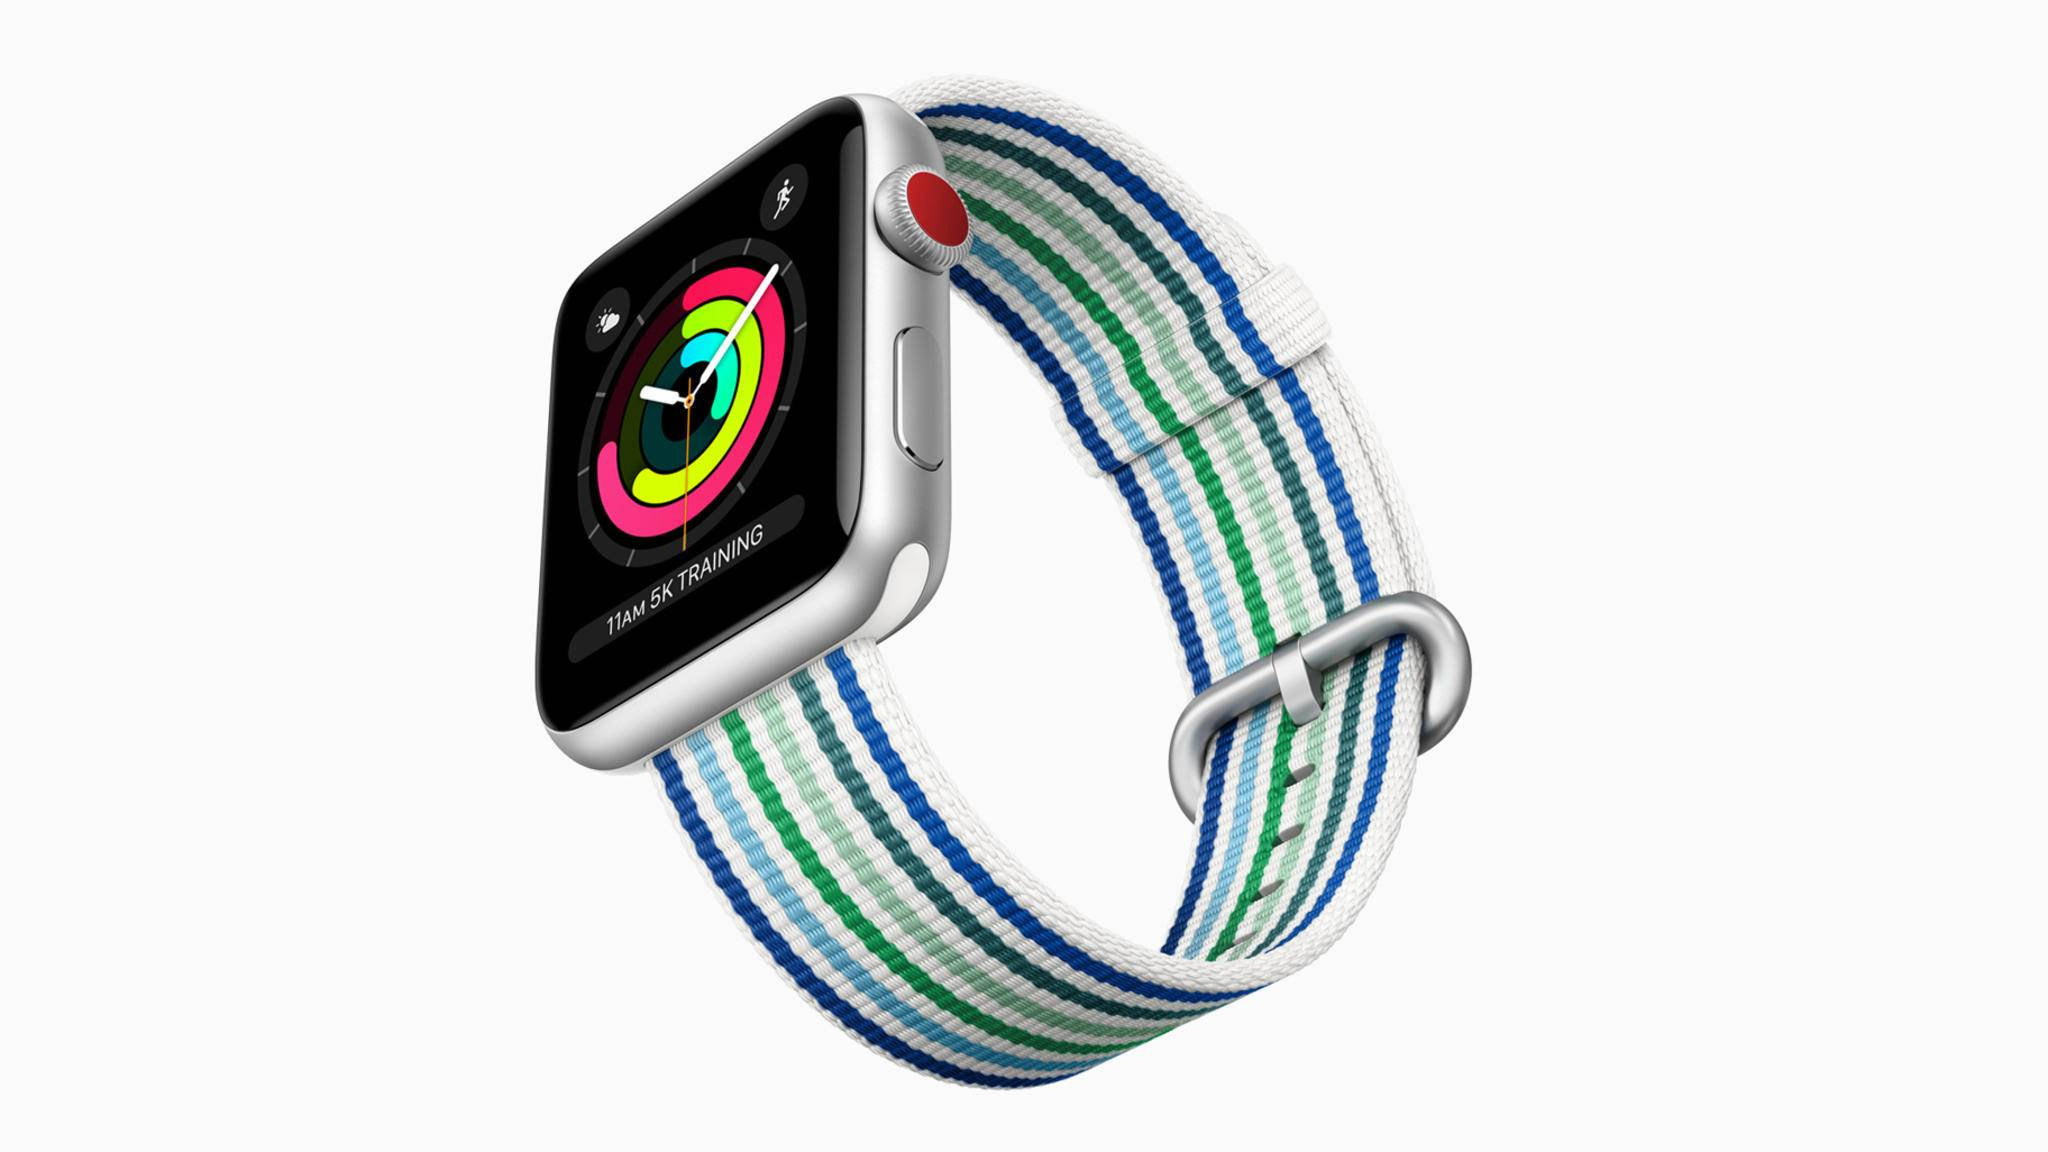 Streifen am Apple-Watch-Armband bringen den Frühling ans Handgelenk.